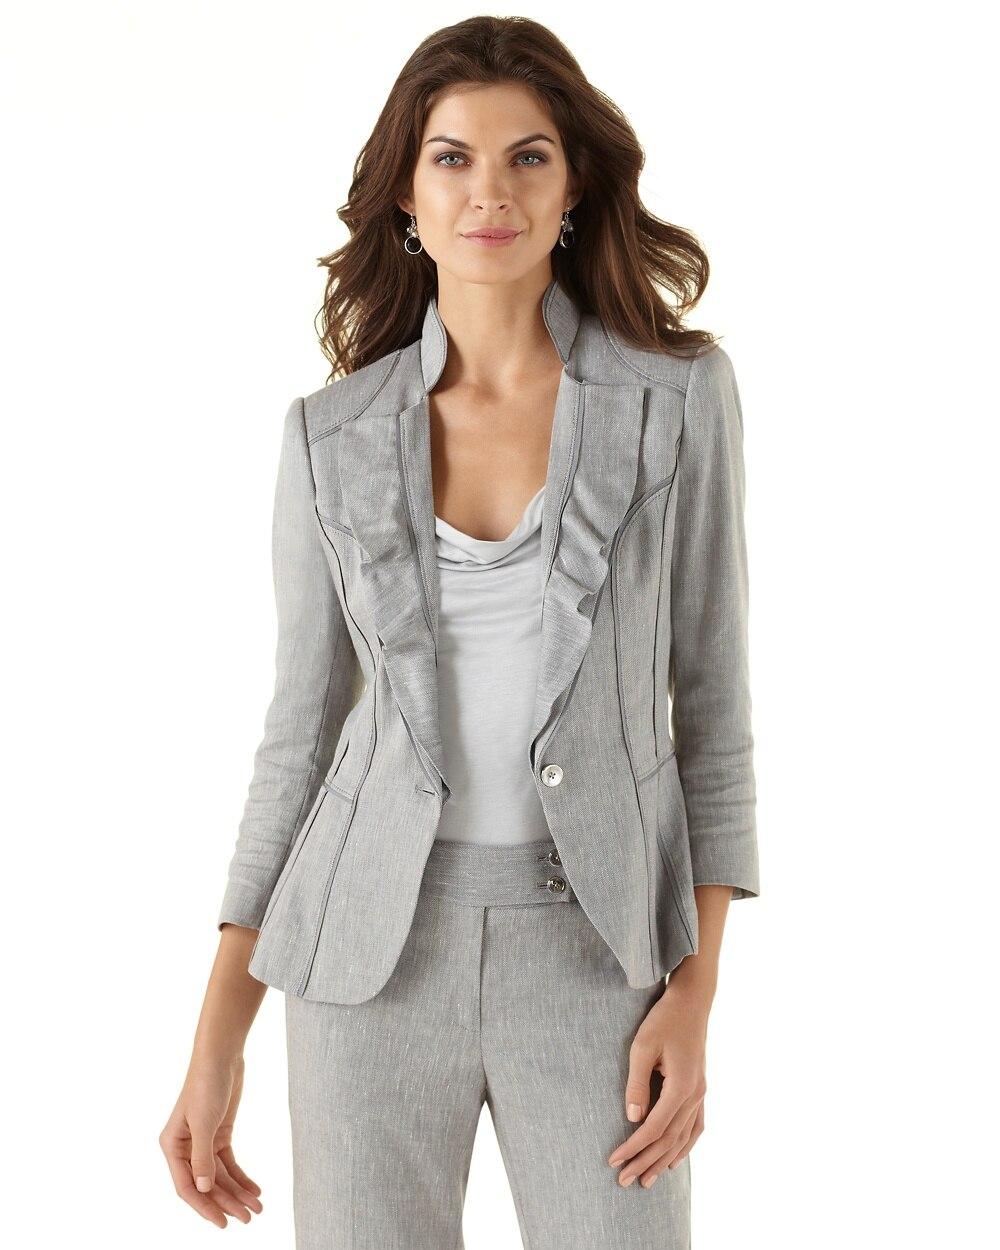 Ruffle Lapel Gray Suit Jacket White House Black Market